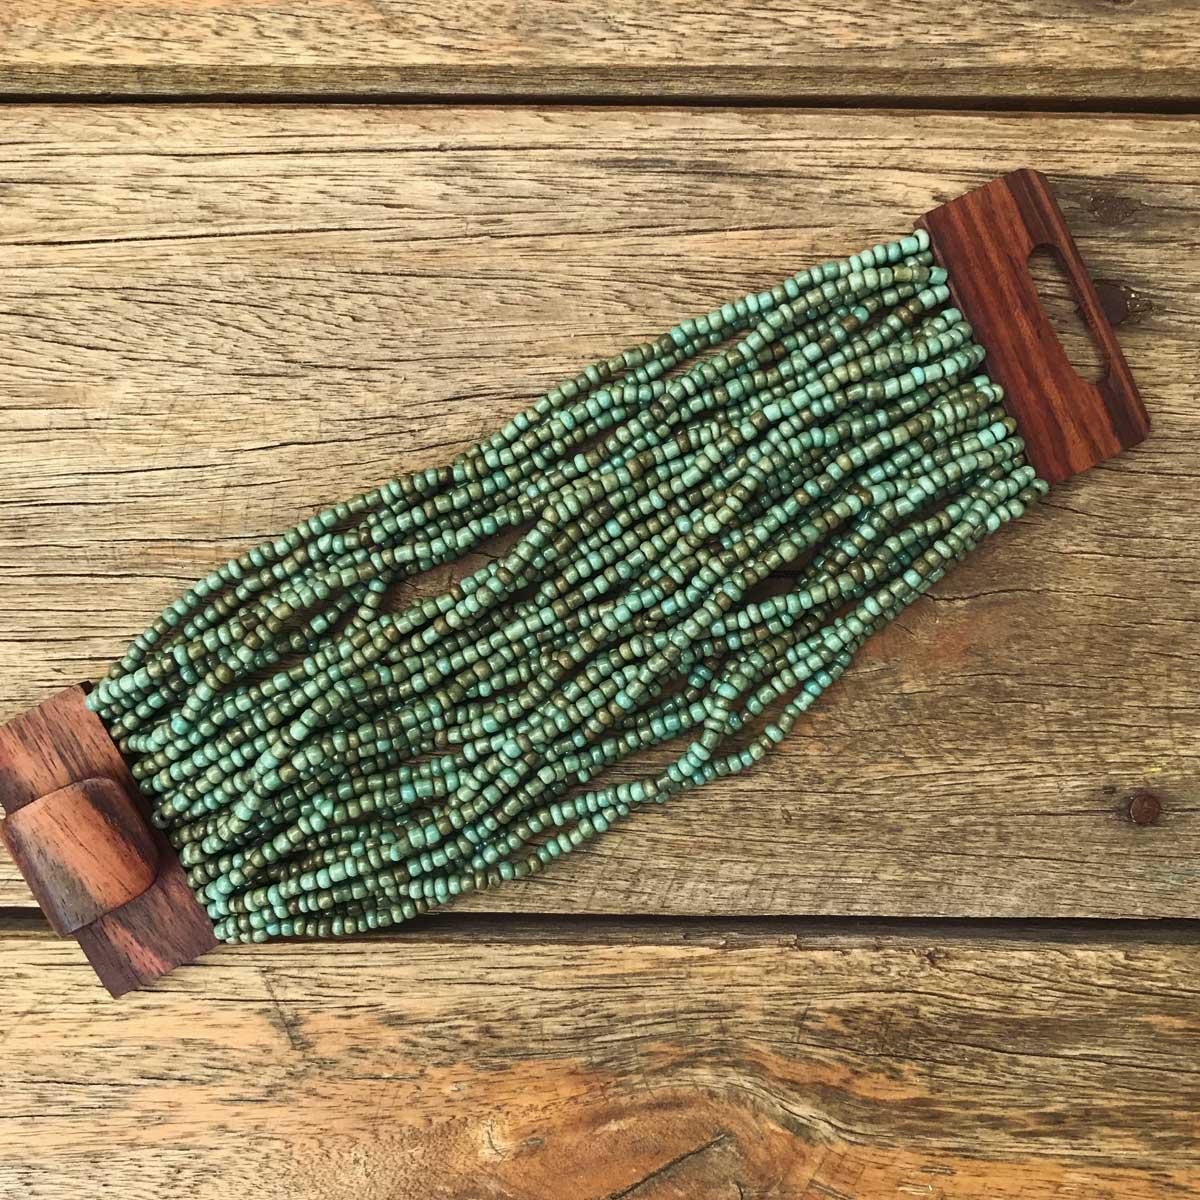 Pulseira de miçanga e fecho madeira turquesa Esverdeado